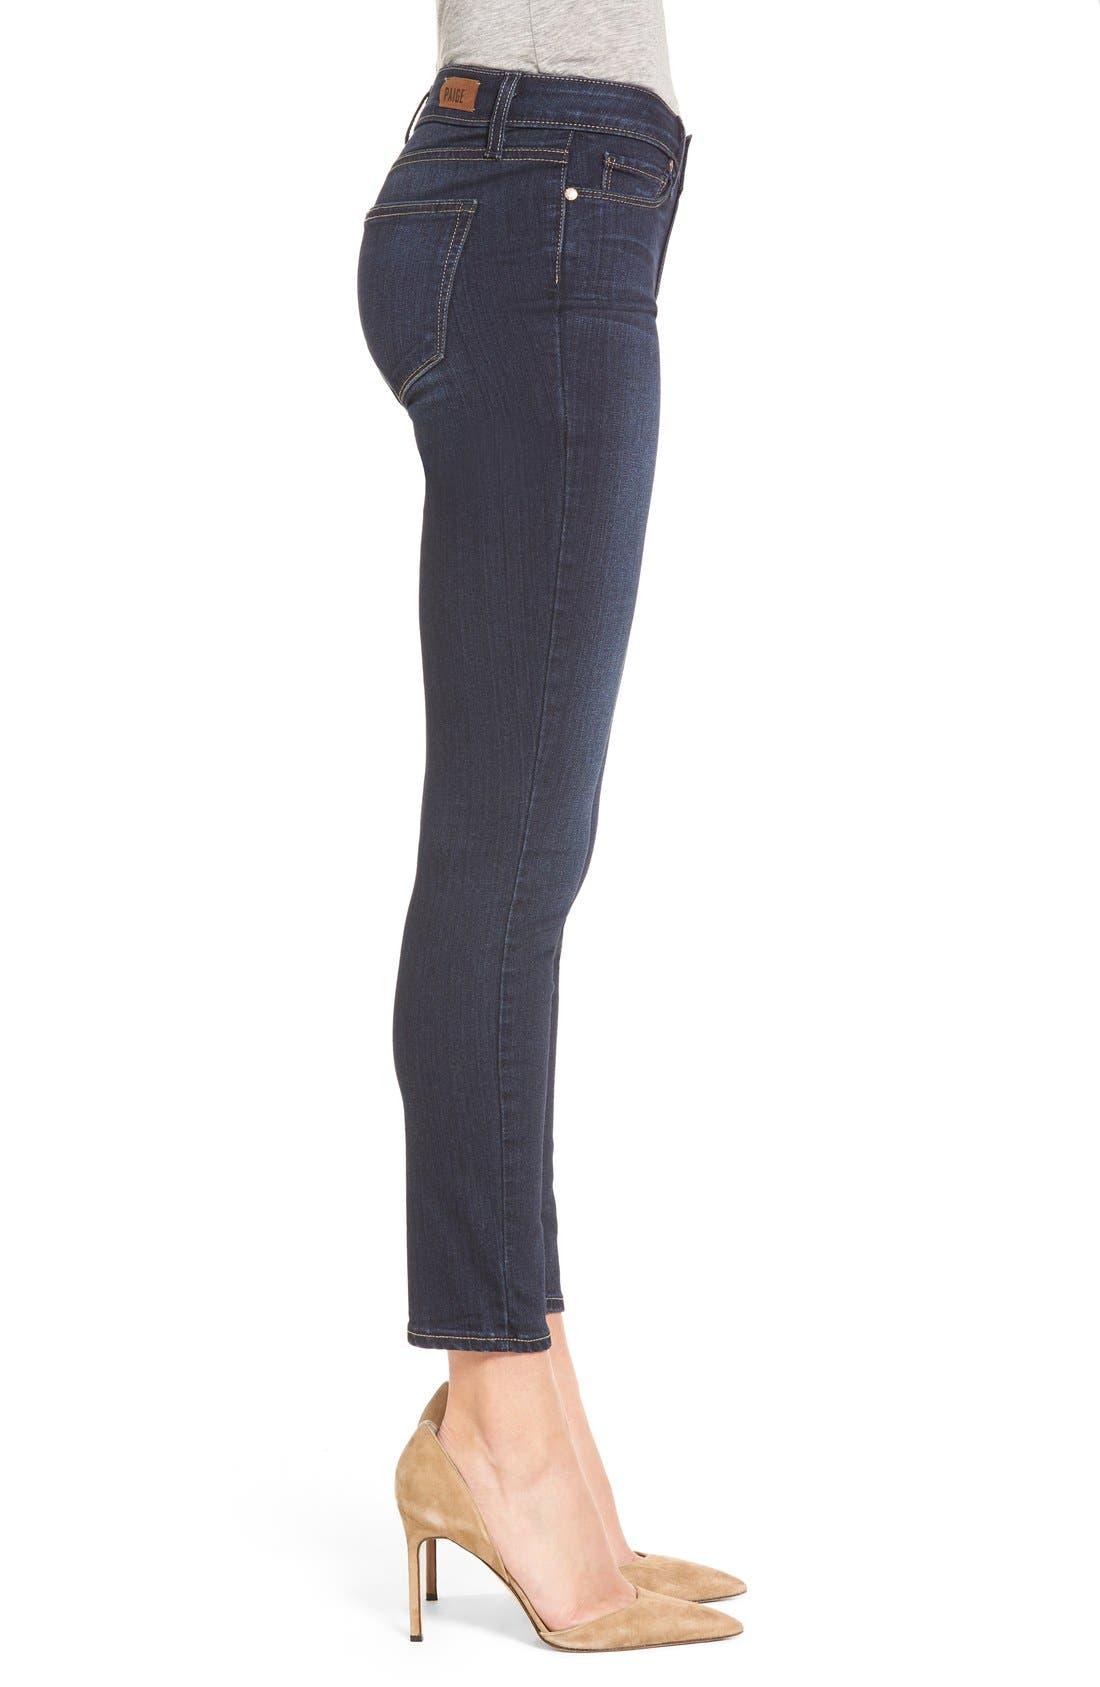 Transcend - Verdugo Ankle Ultra Skinny Jeans,                             Alternate thumbnail 4, color,                             Hartmann